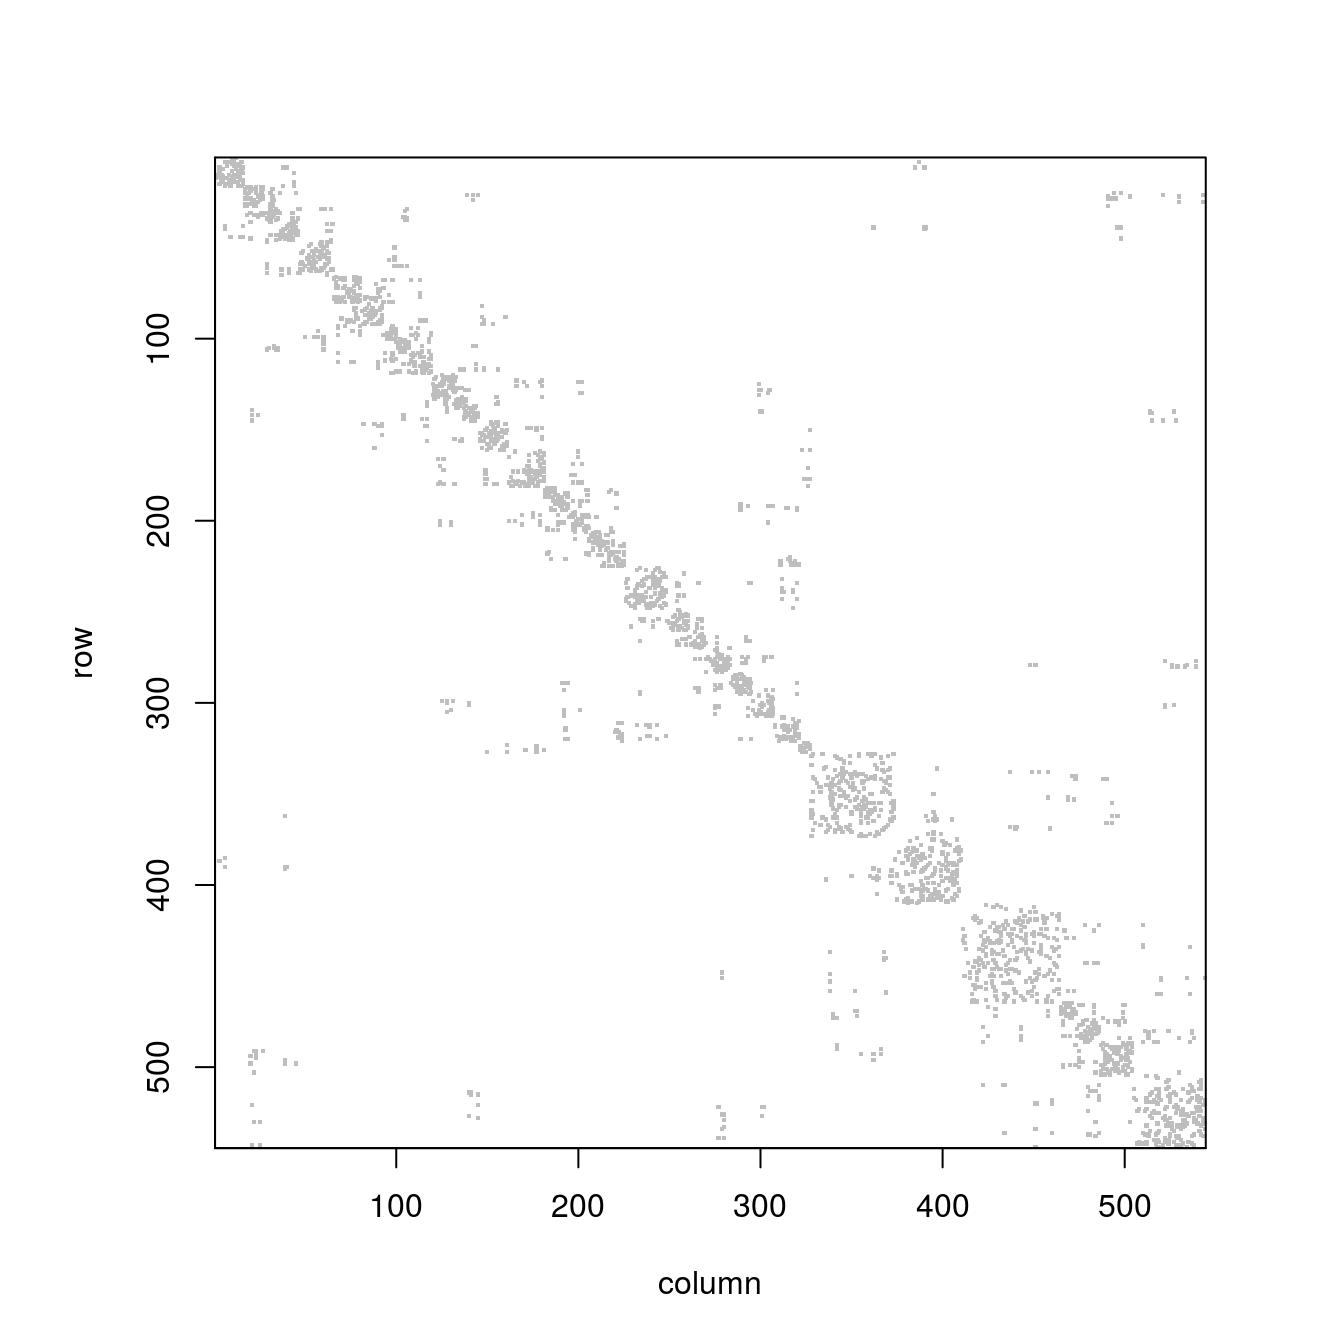 public/docs/index_files/figure-html/sparsematrix-1.png